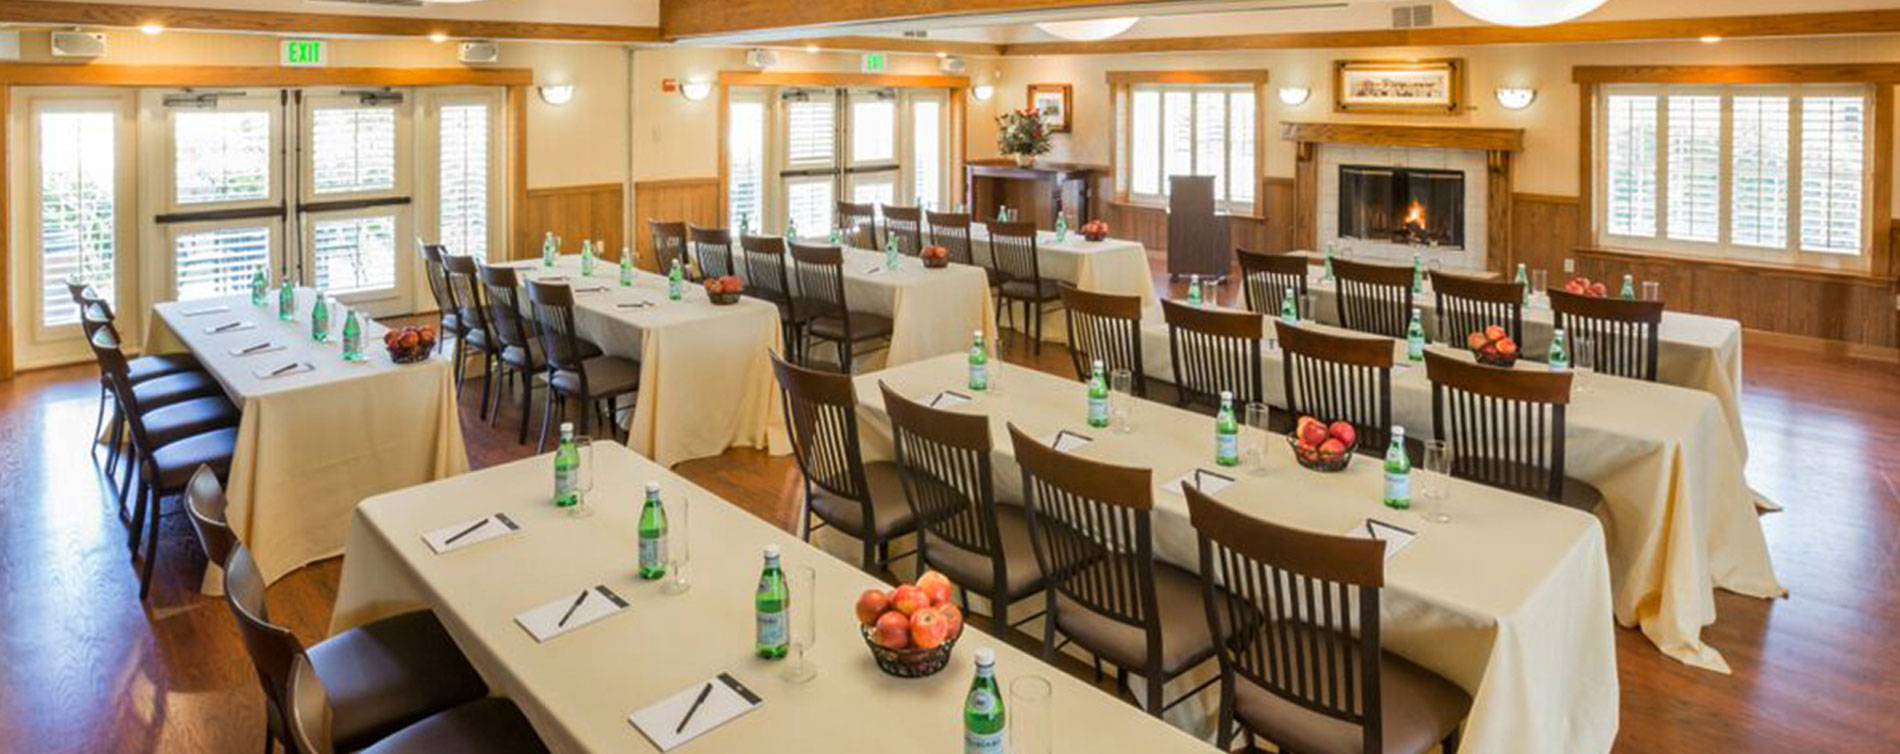 Meetings at BEST WESTERN Sonoma Valley Inn & Krug Event Center, California